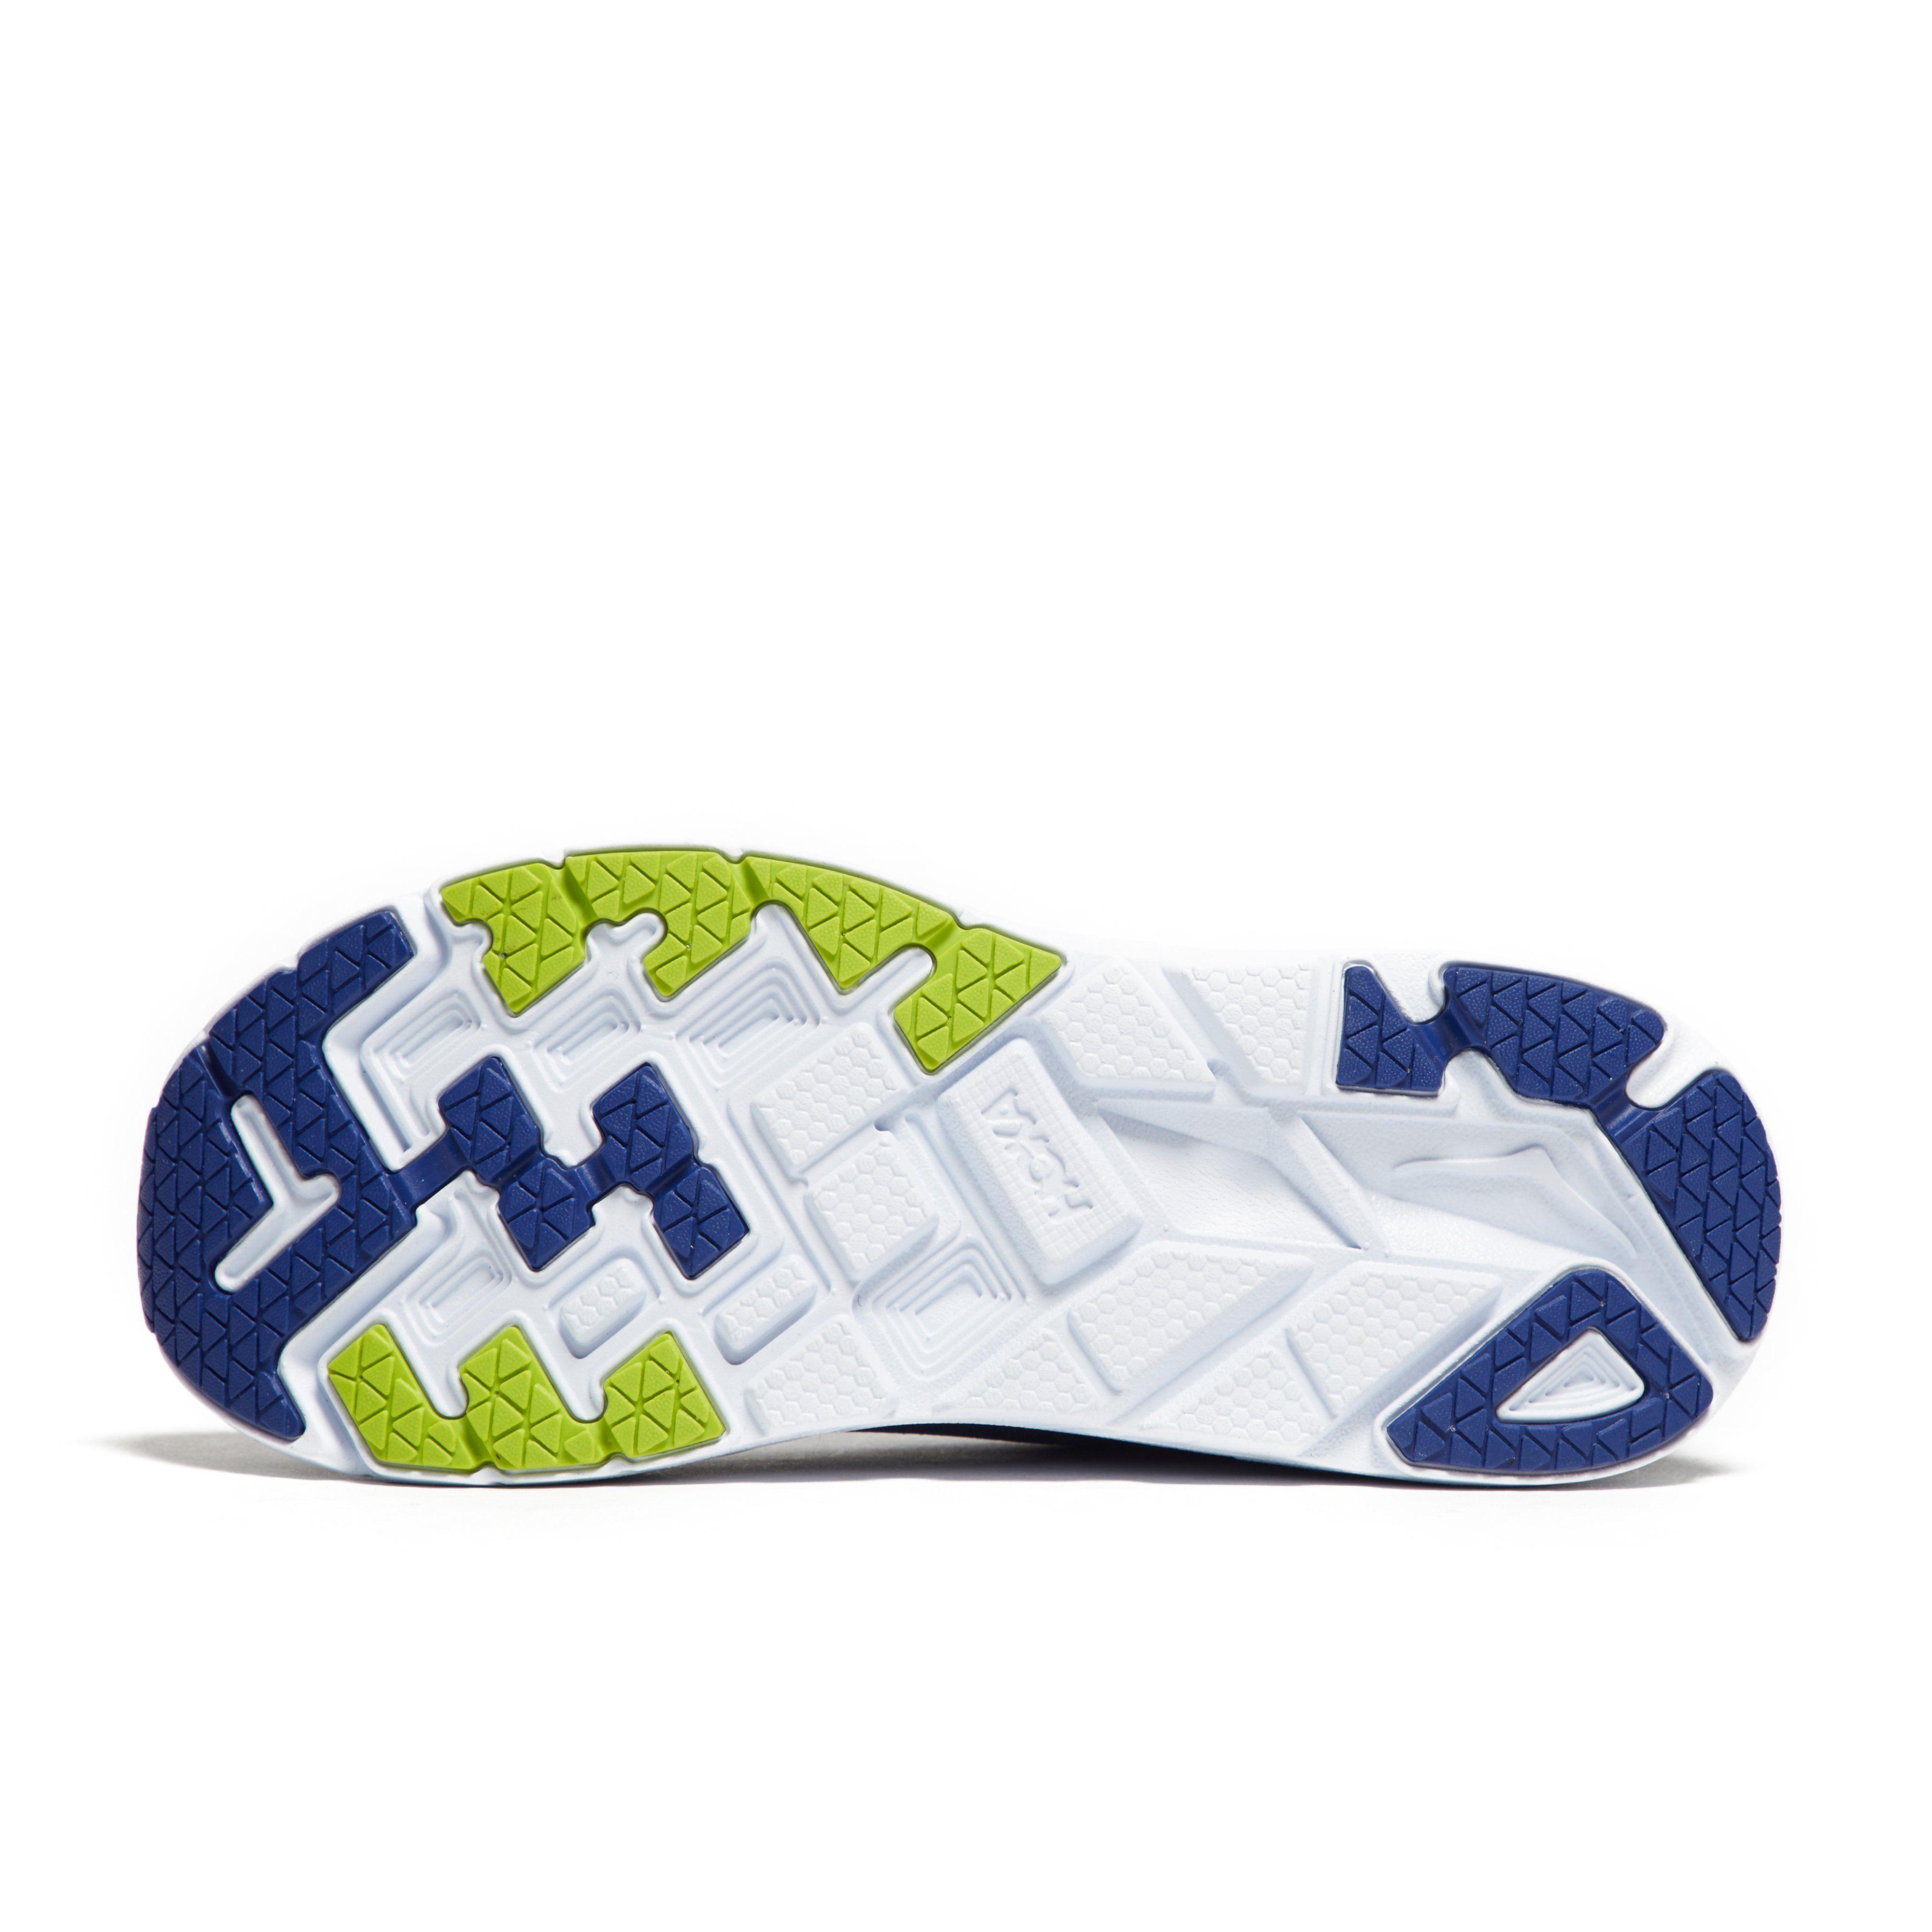 Hoka One One Clifton 5 Men's Running Shoes